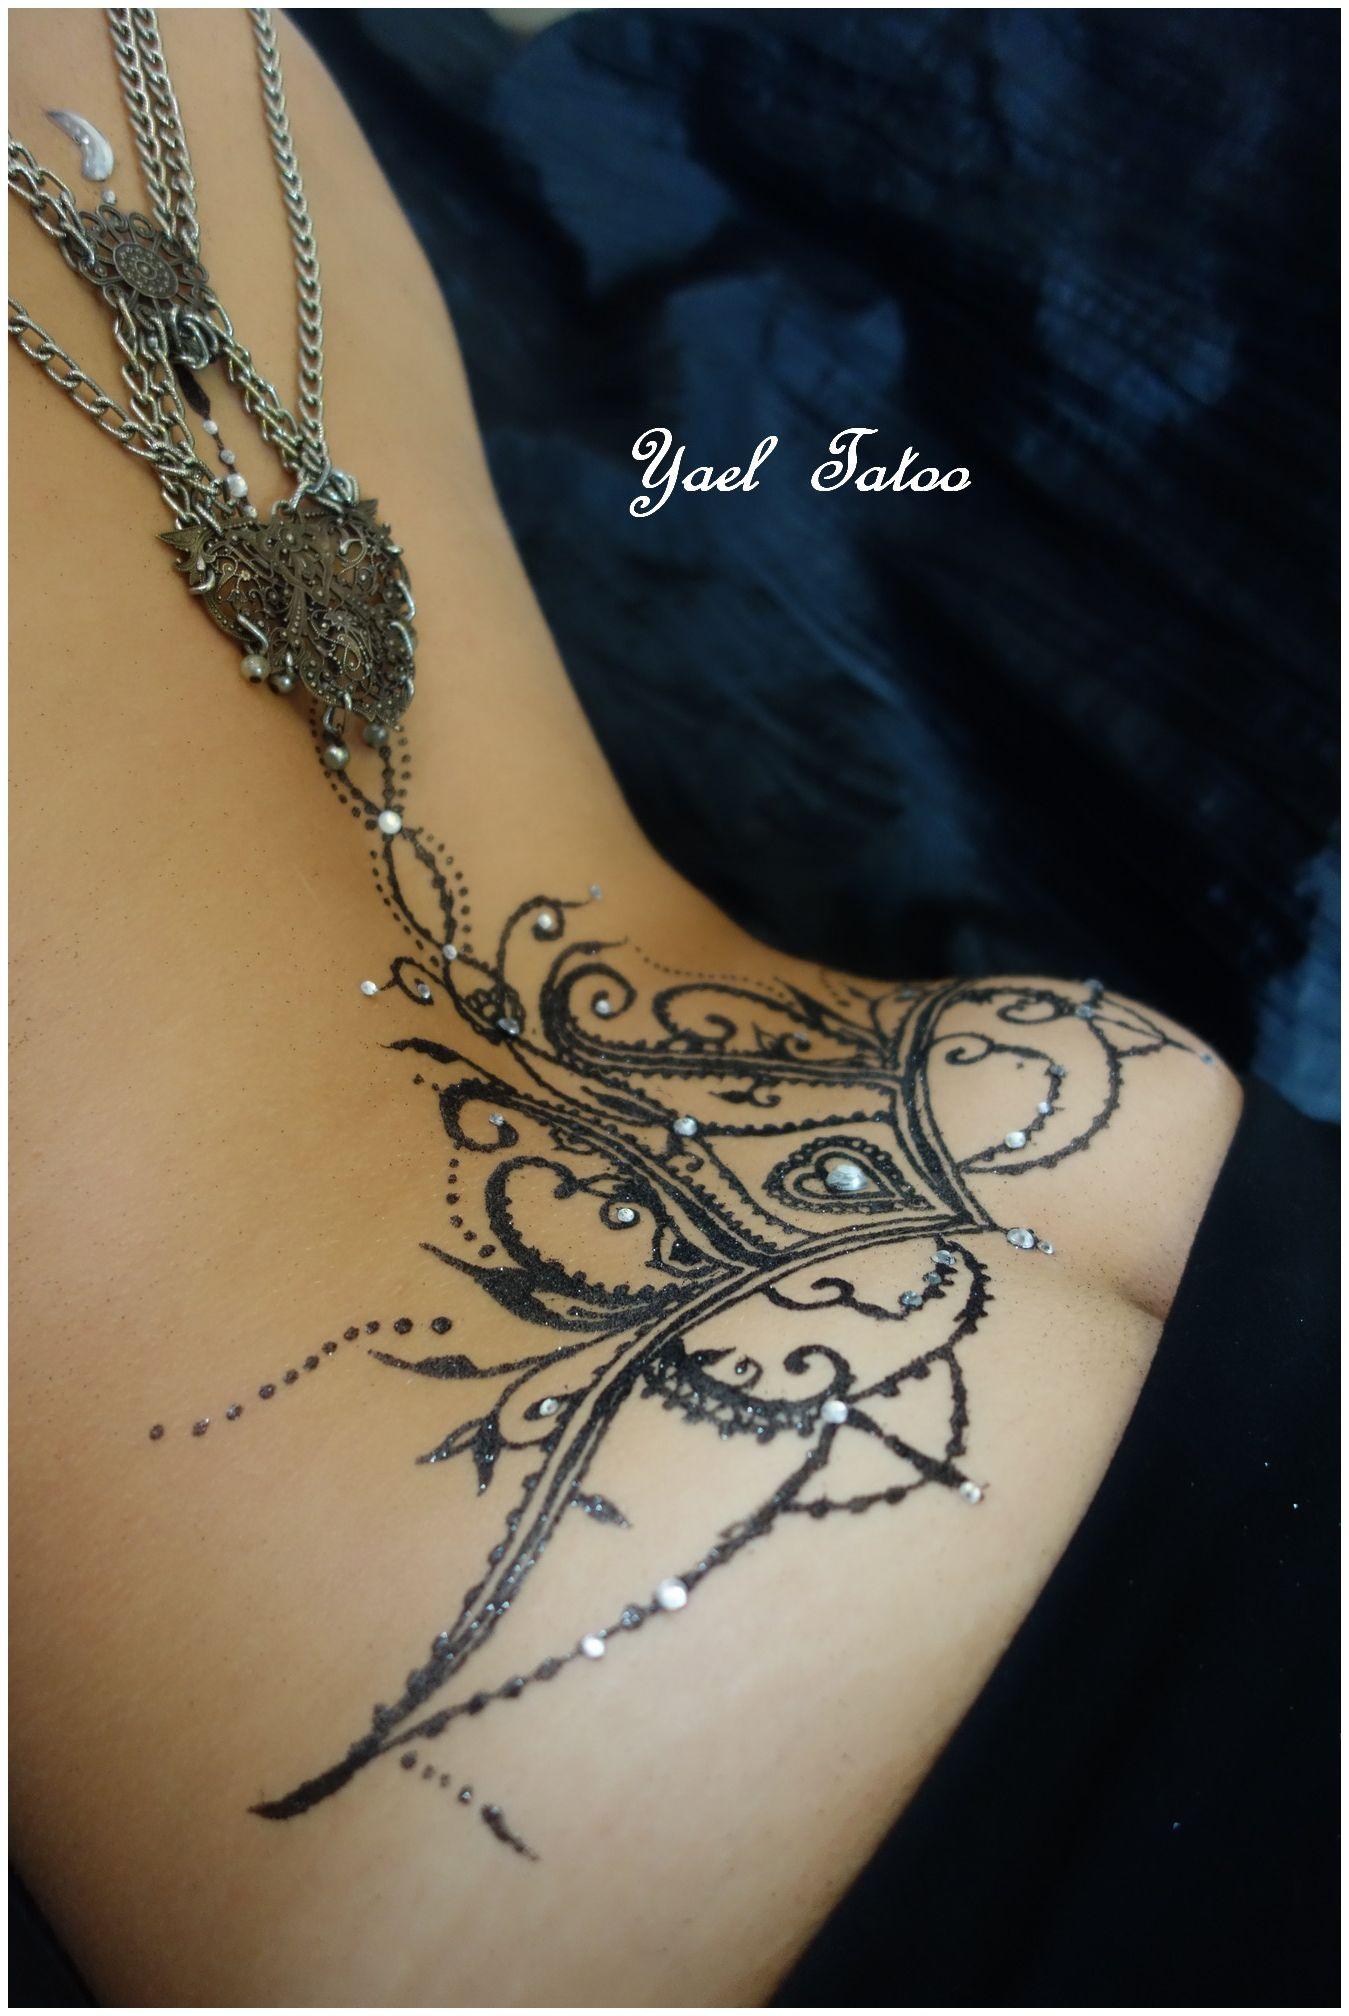 Tatouage Henne Sensuel Bas Du Dos Tatouages Sensuels Sexy Tatoos